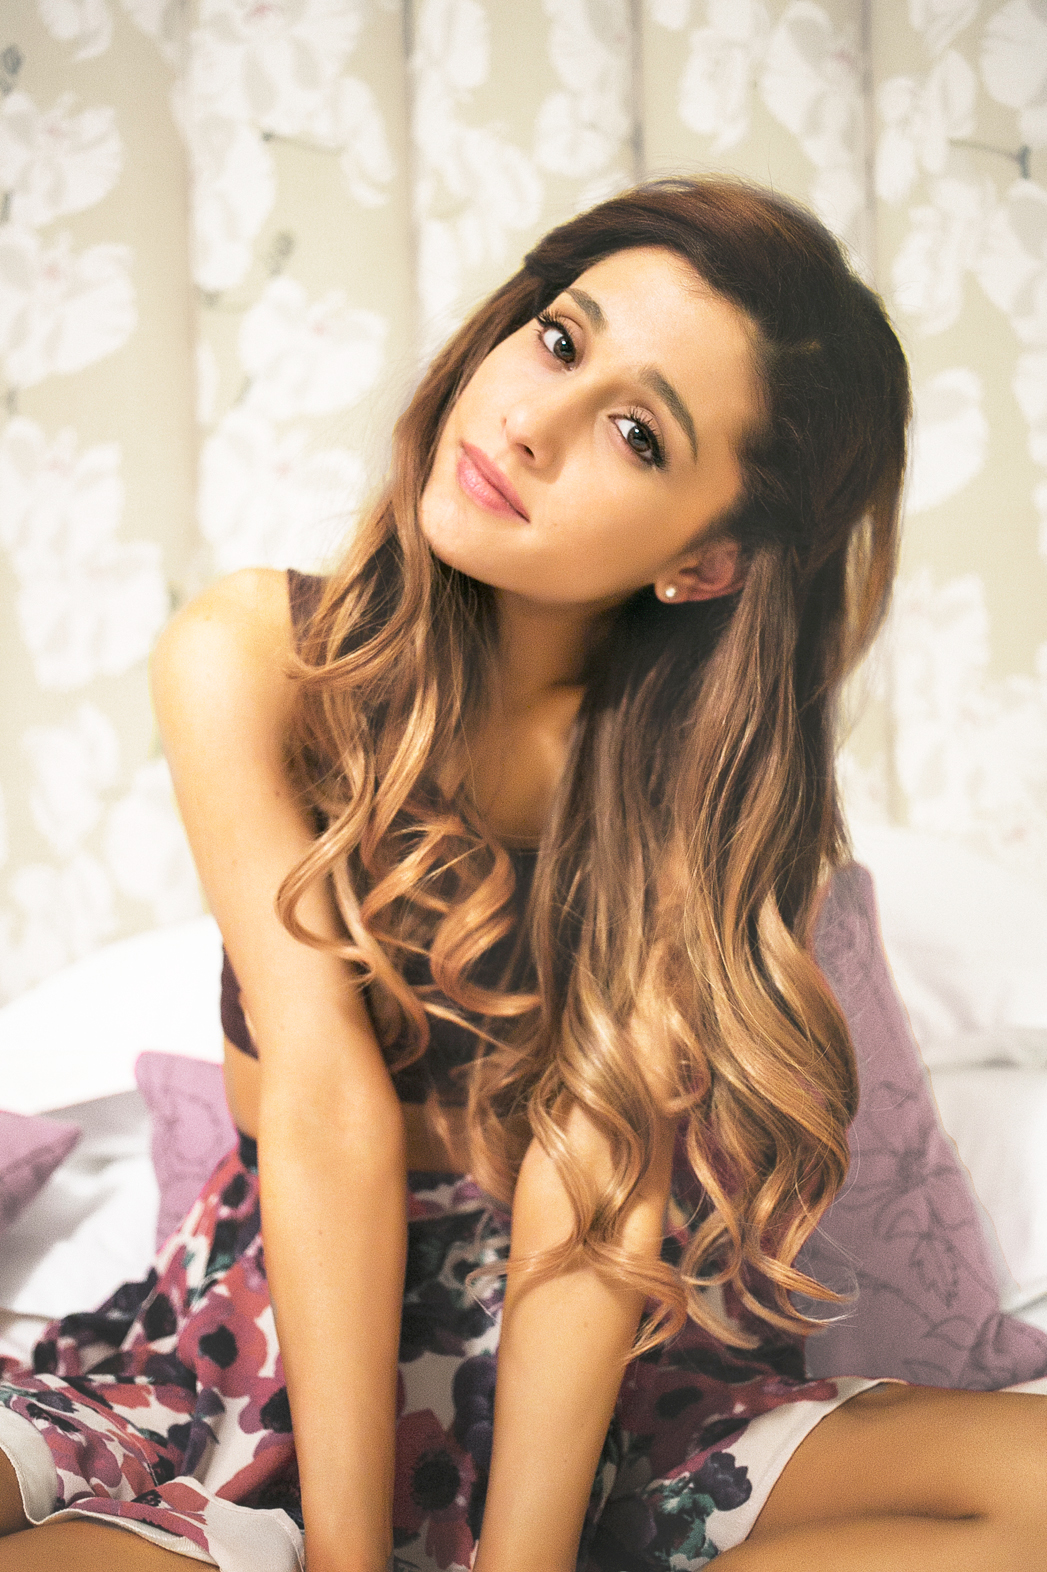 Ariana Grande PR Image - P 2014